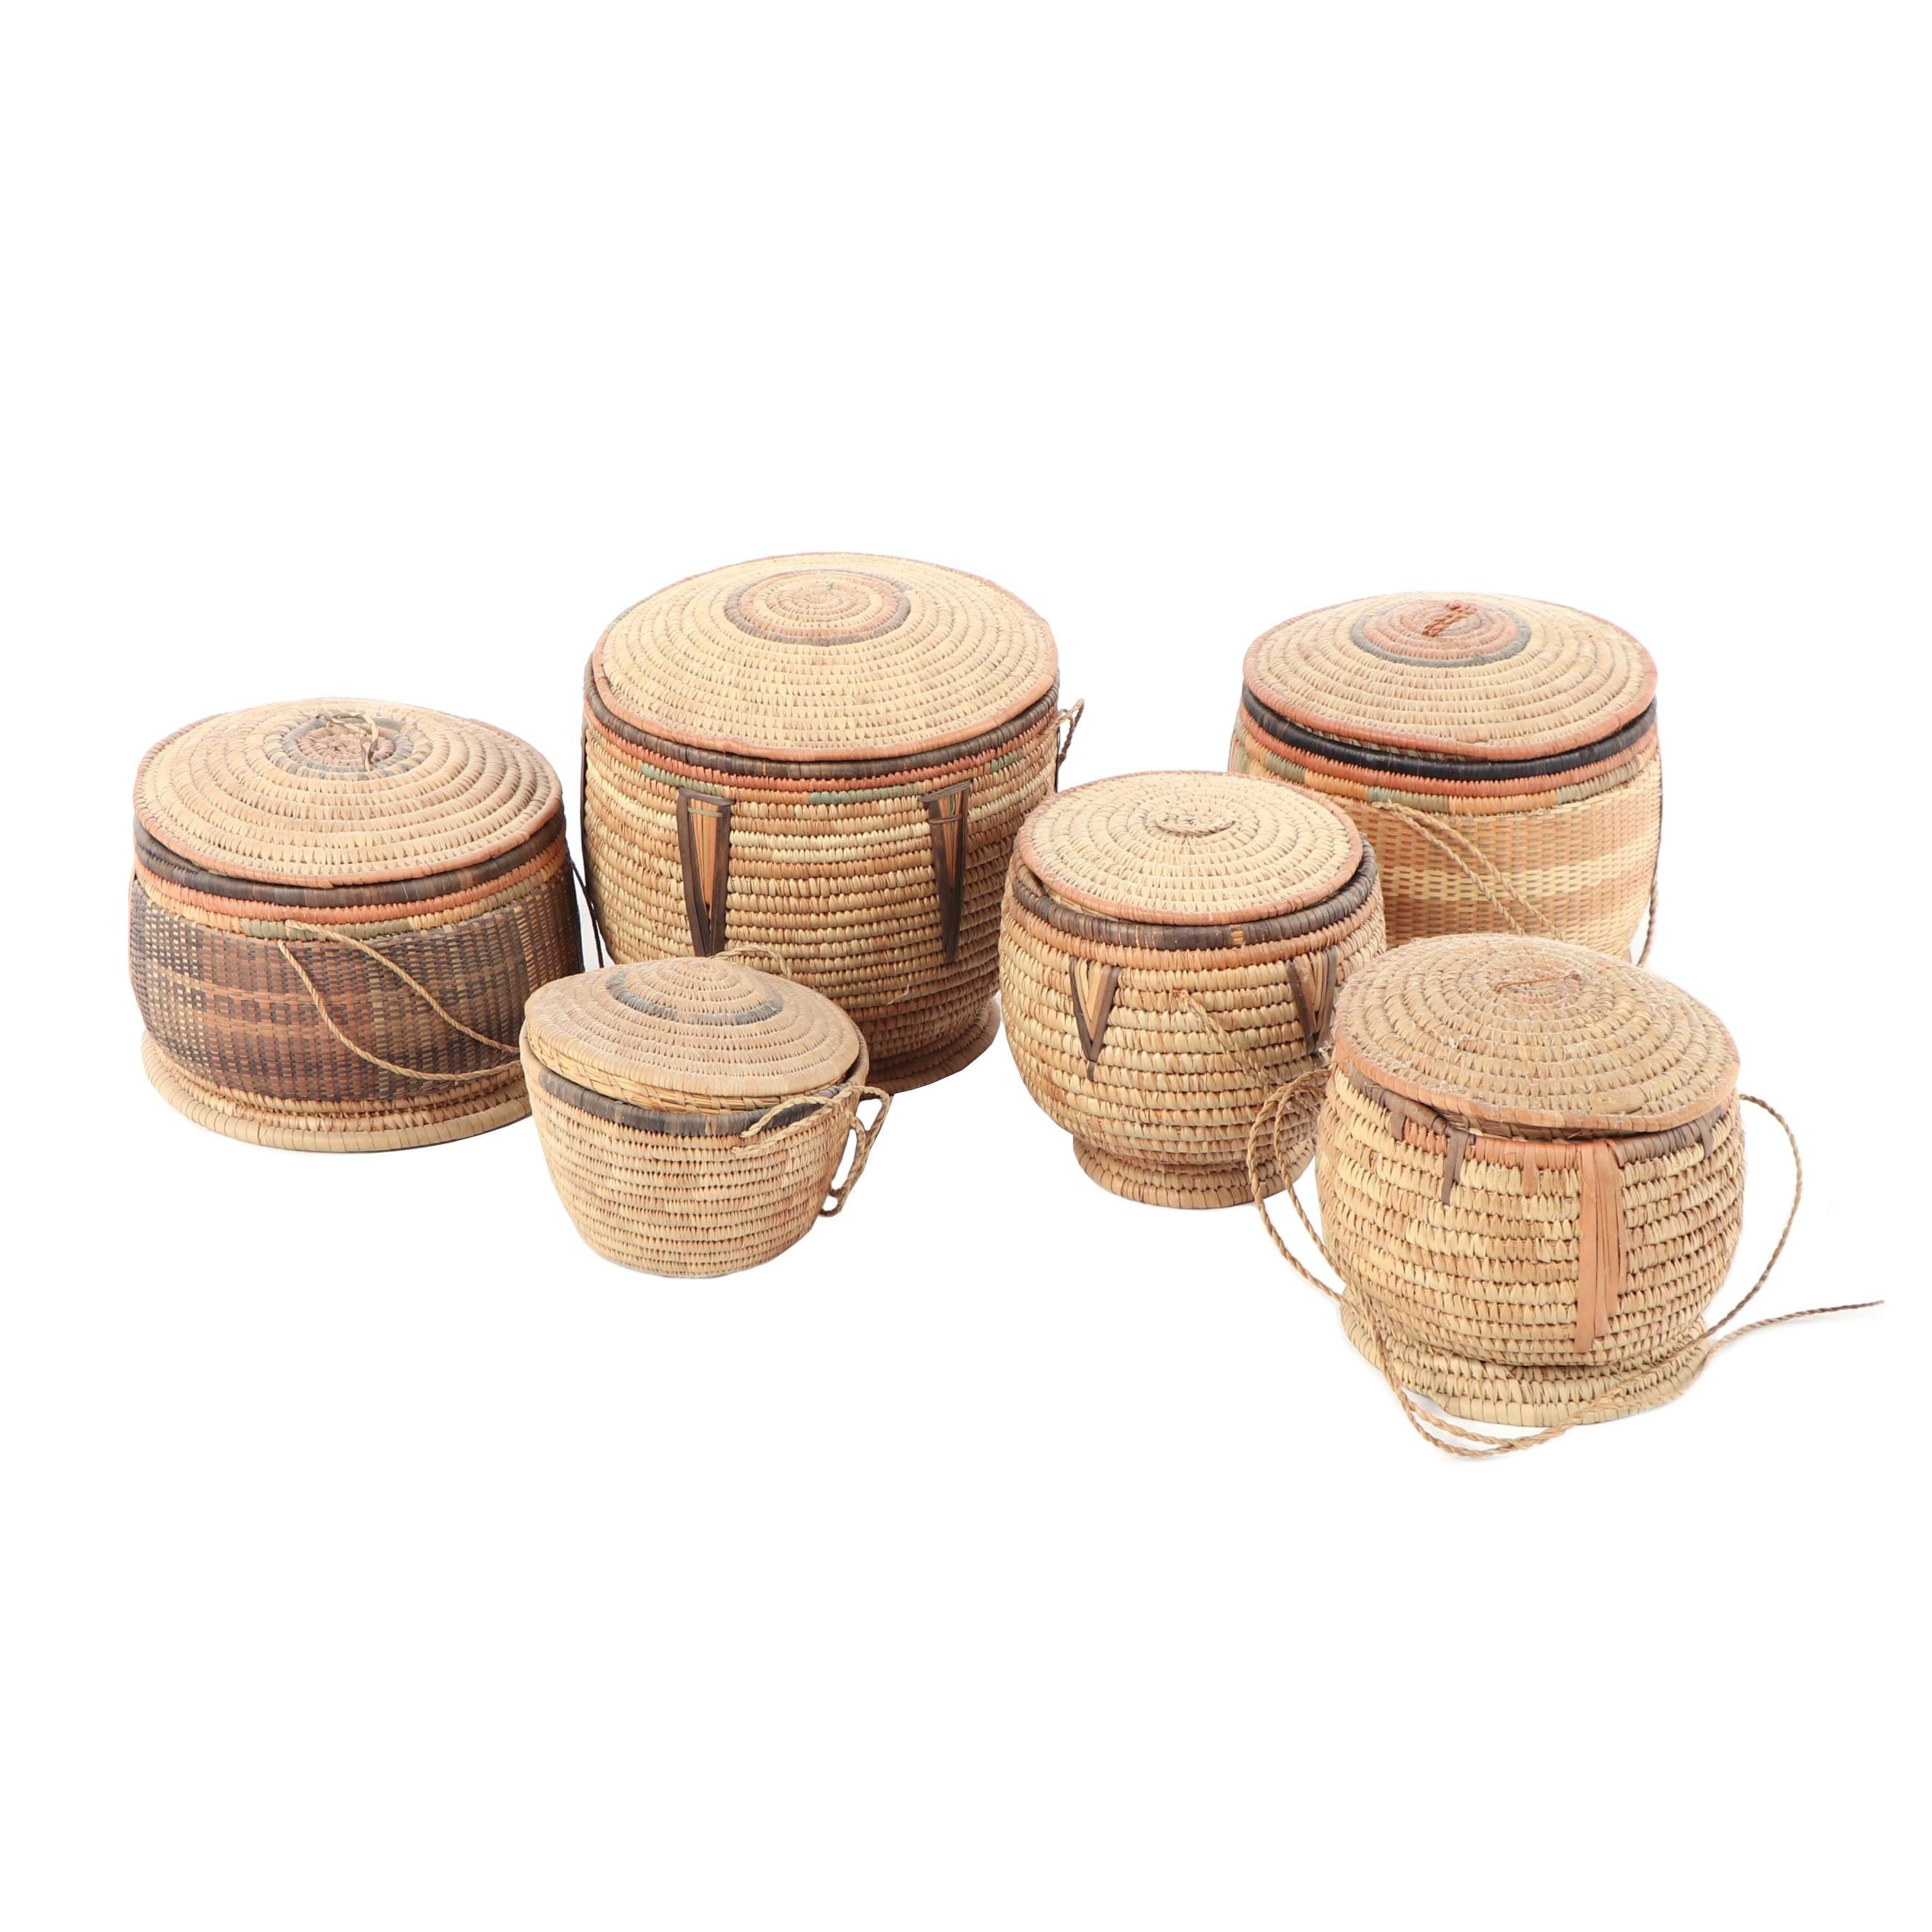 Vintage African Style Lidded Coil Baskets